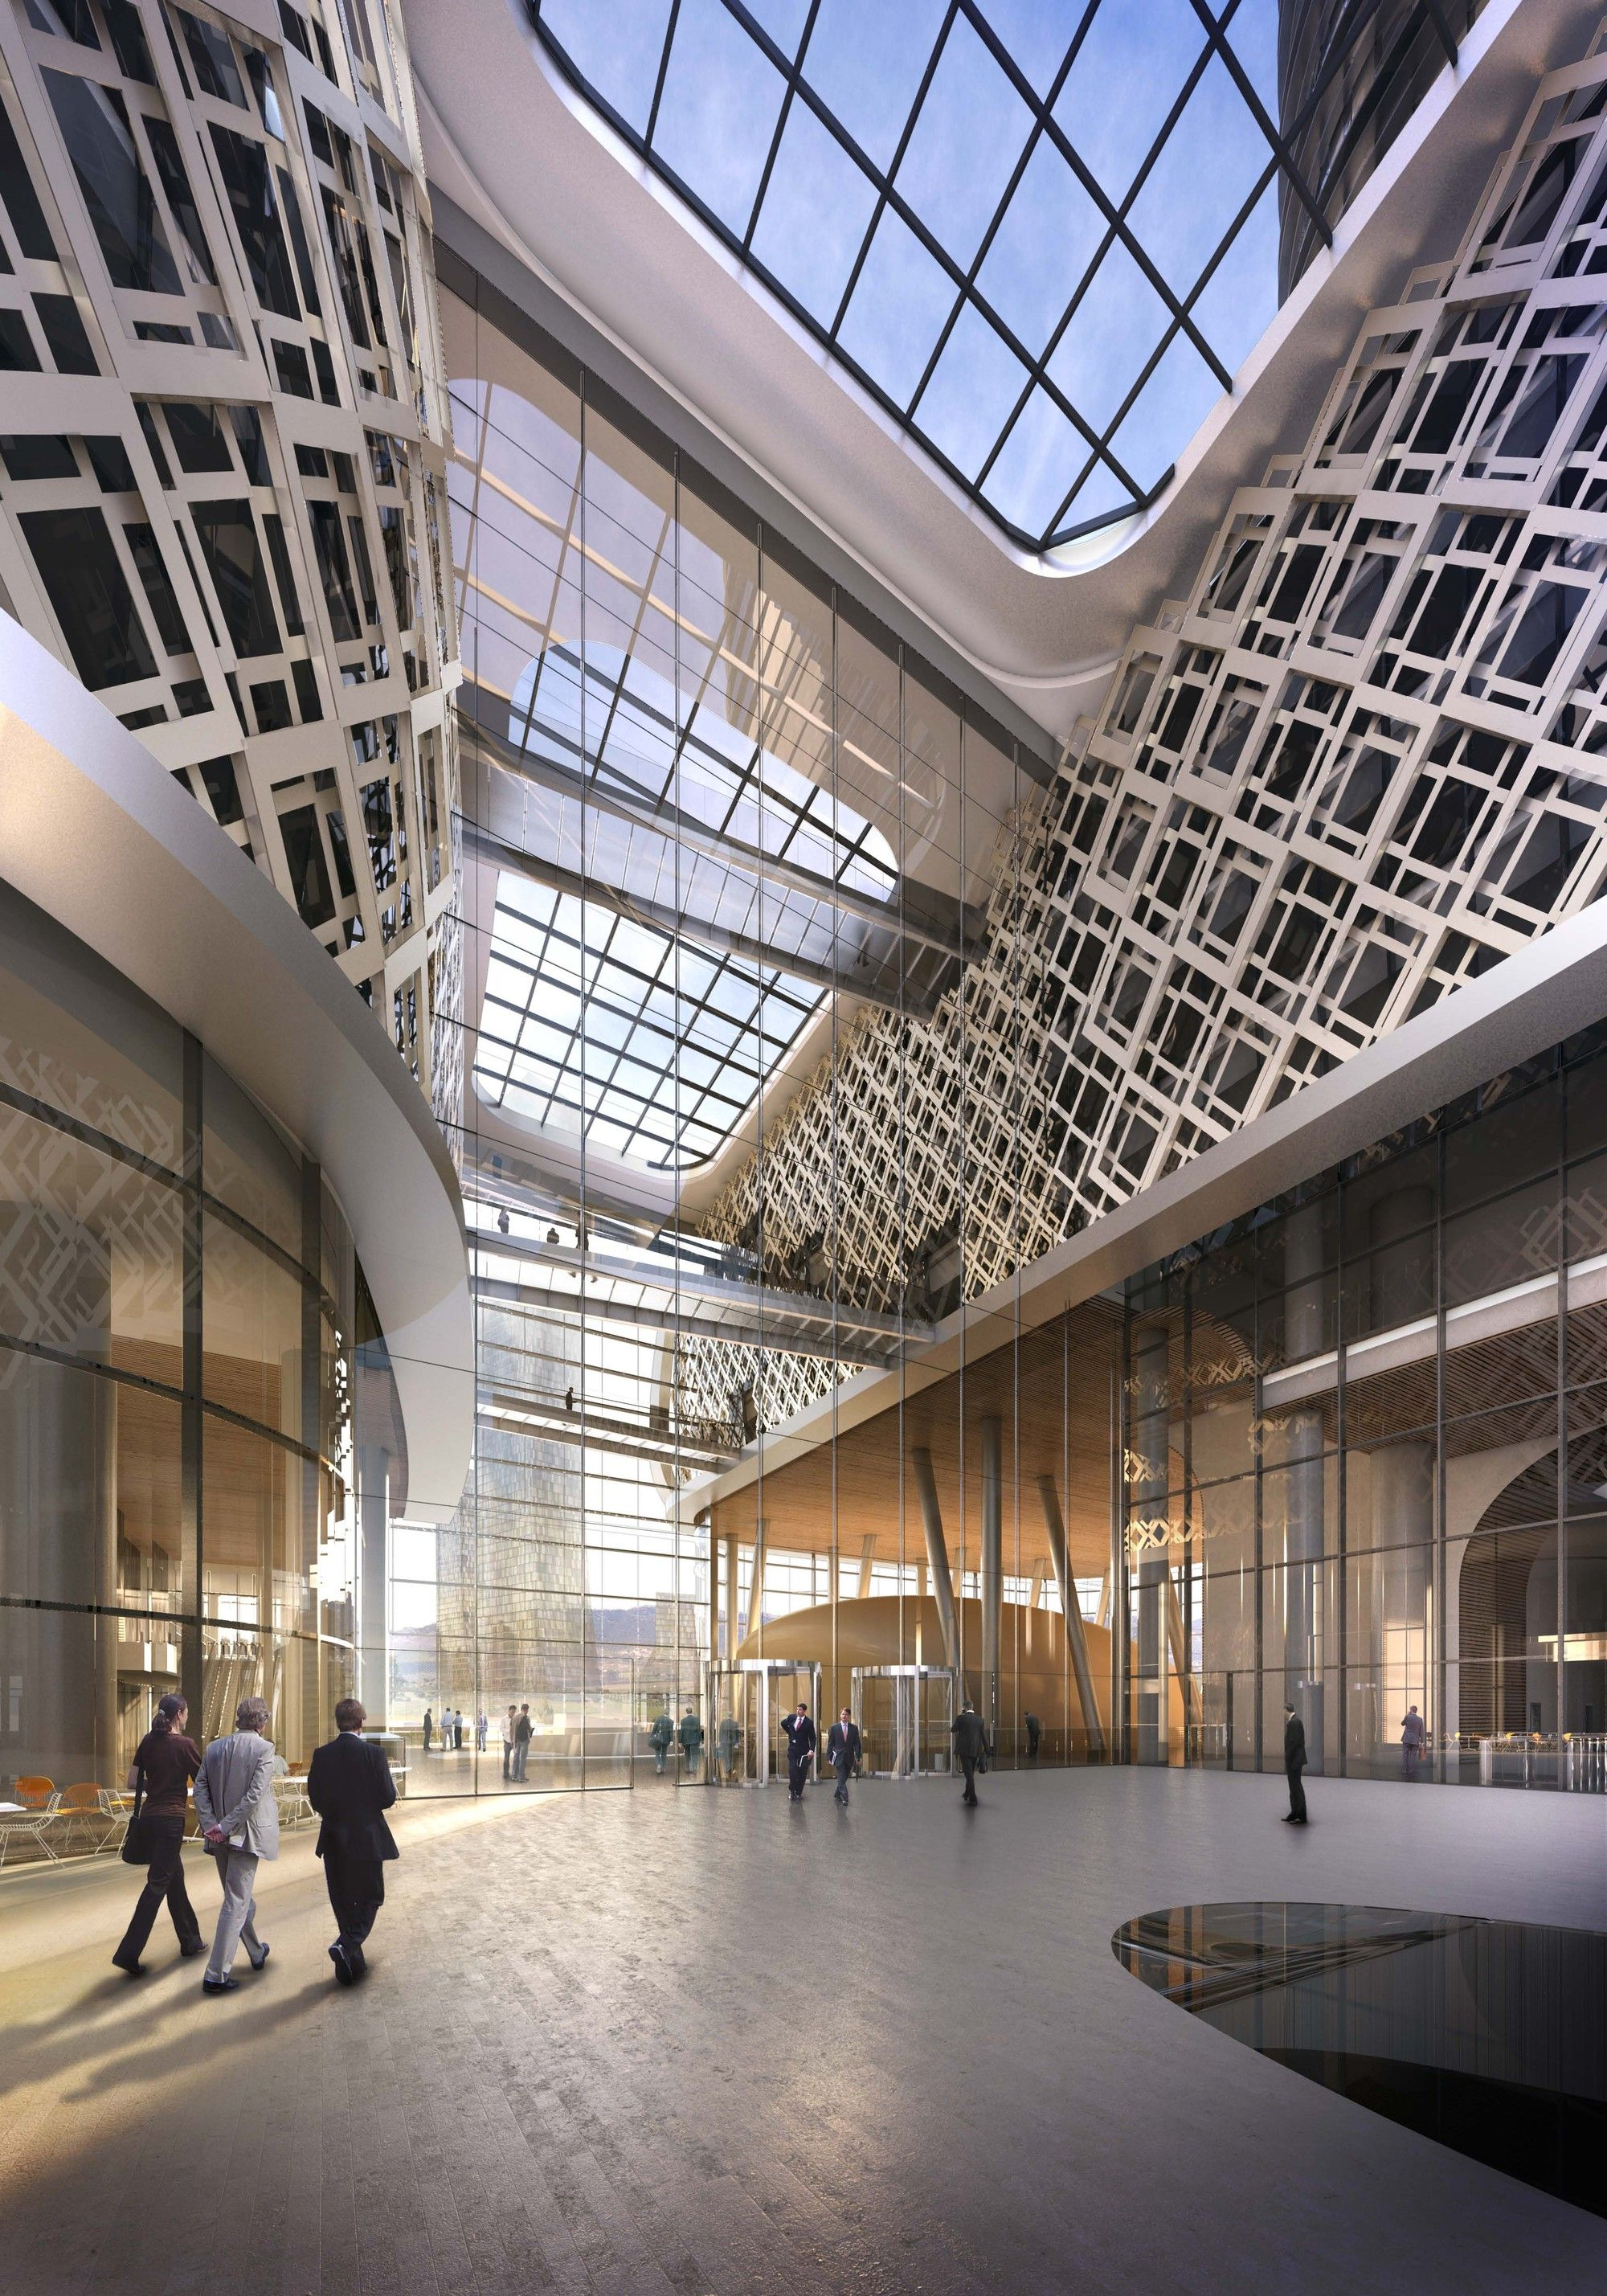 Gallery Of Ziraat Bank Headquarters Kpf 4 Architecture Visualization 3d Architectural Visualization Architecture Design